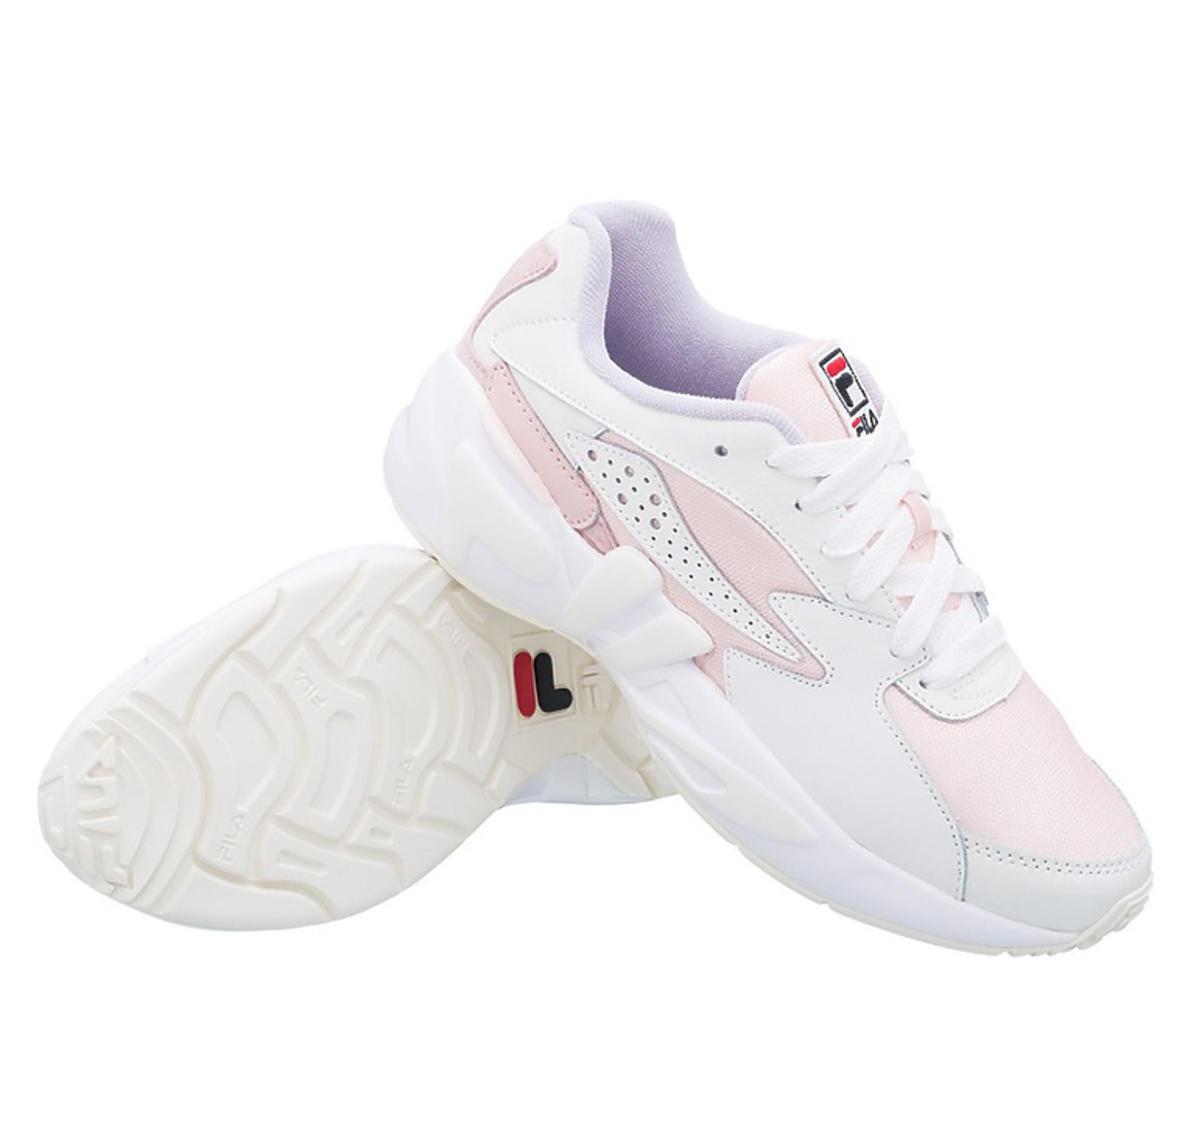 Sneakersy Fila Disruptor w Lidlu